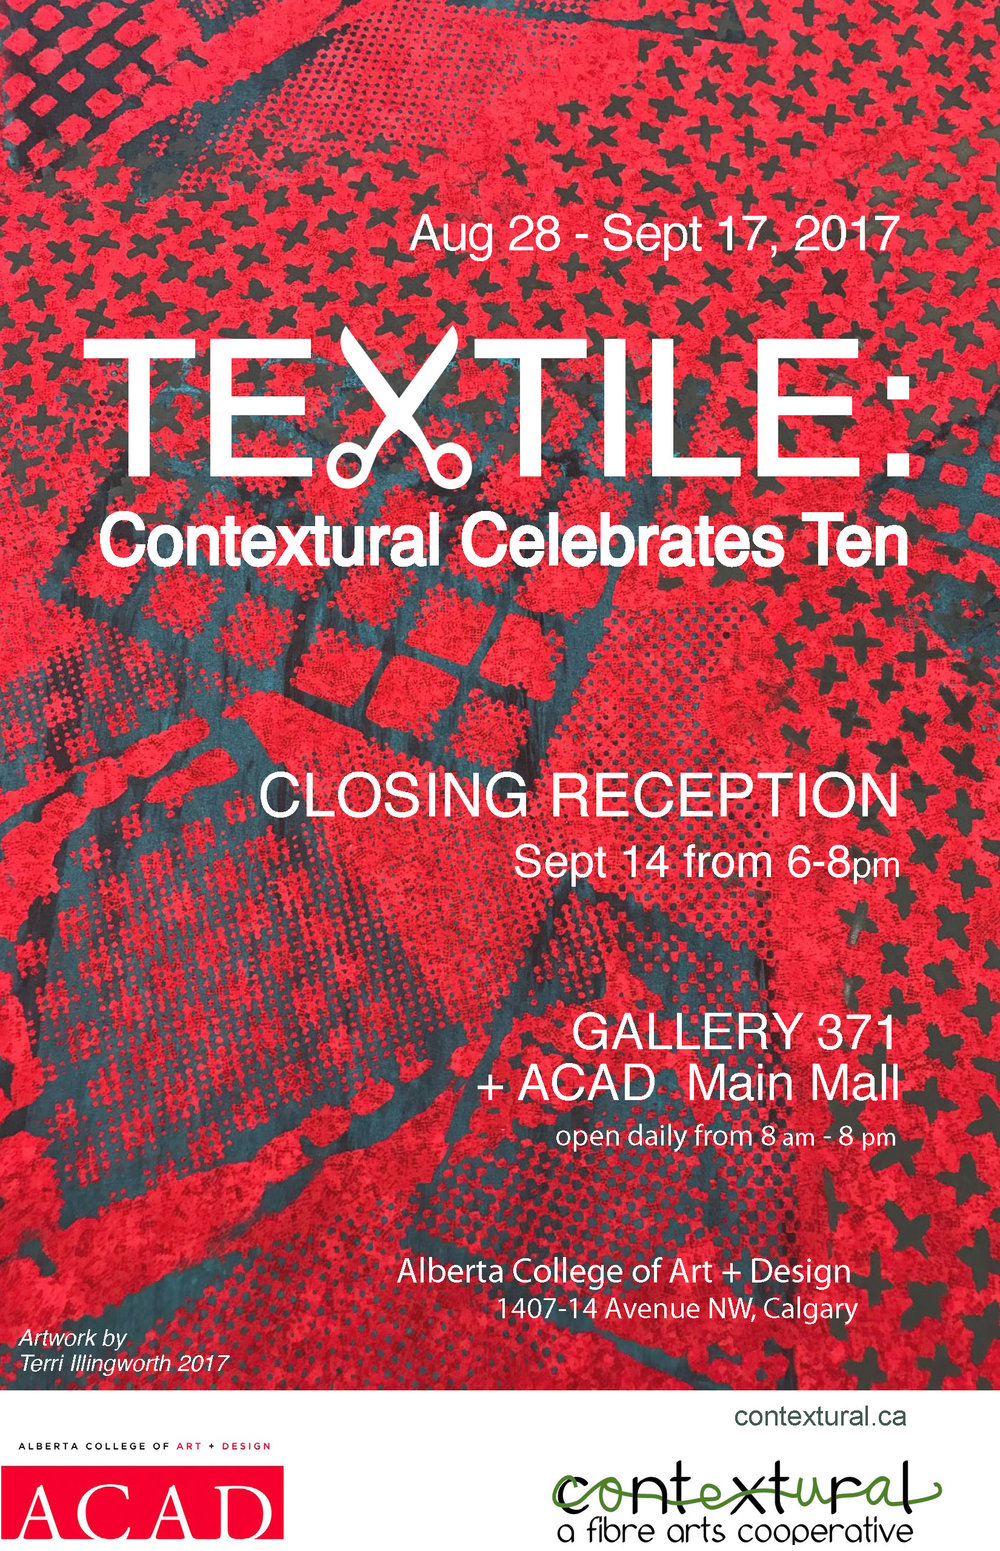 TEXTILE: Contextural Celebrates Ten - Closing reception Thursday, September 14 from 6-8pmGallery 371 + ACAD Main Mallopen daily from 8-8pmContextural.ca